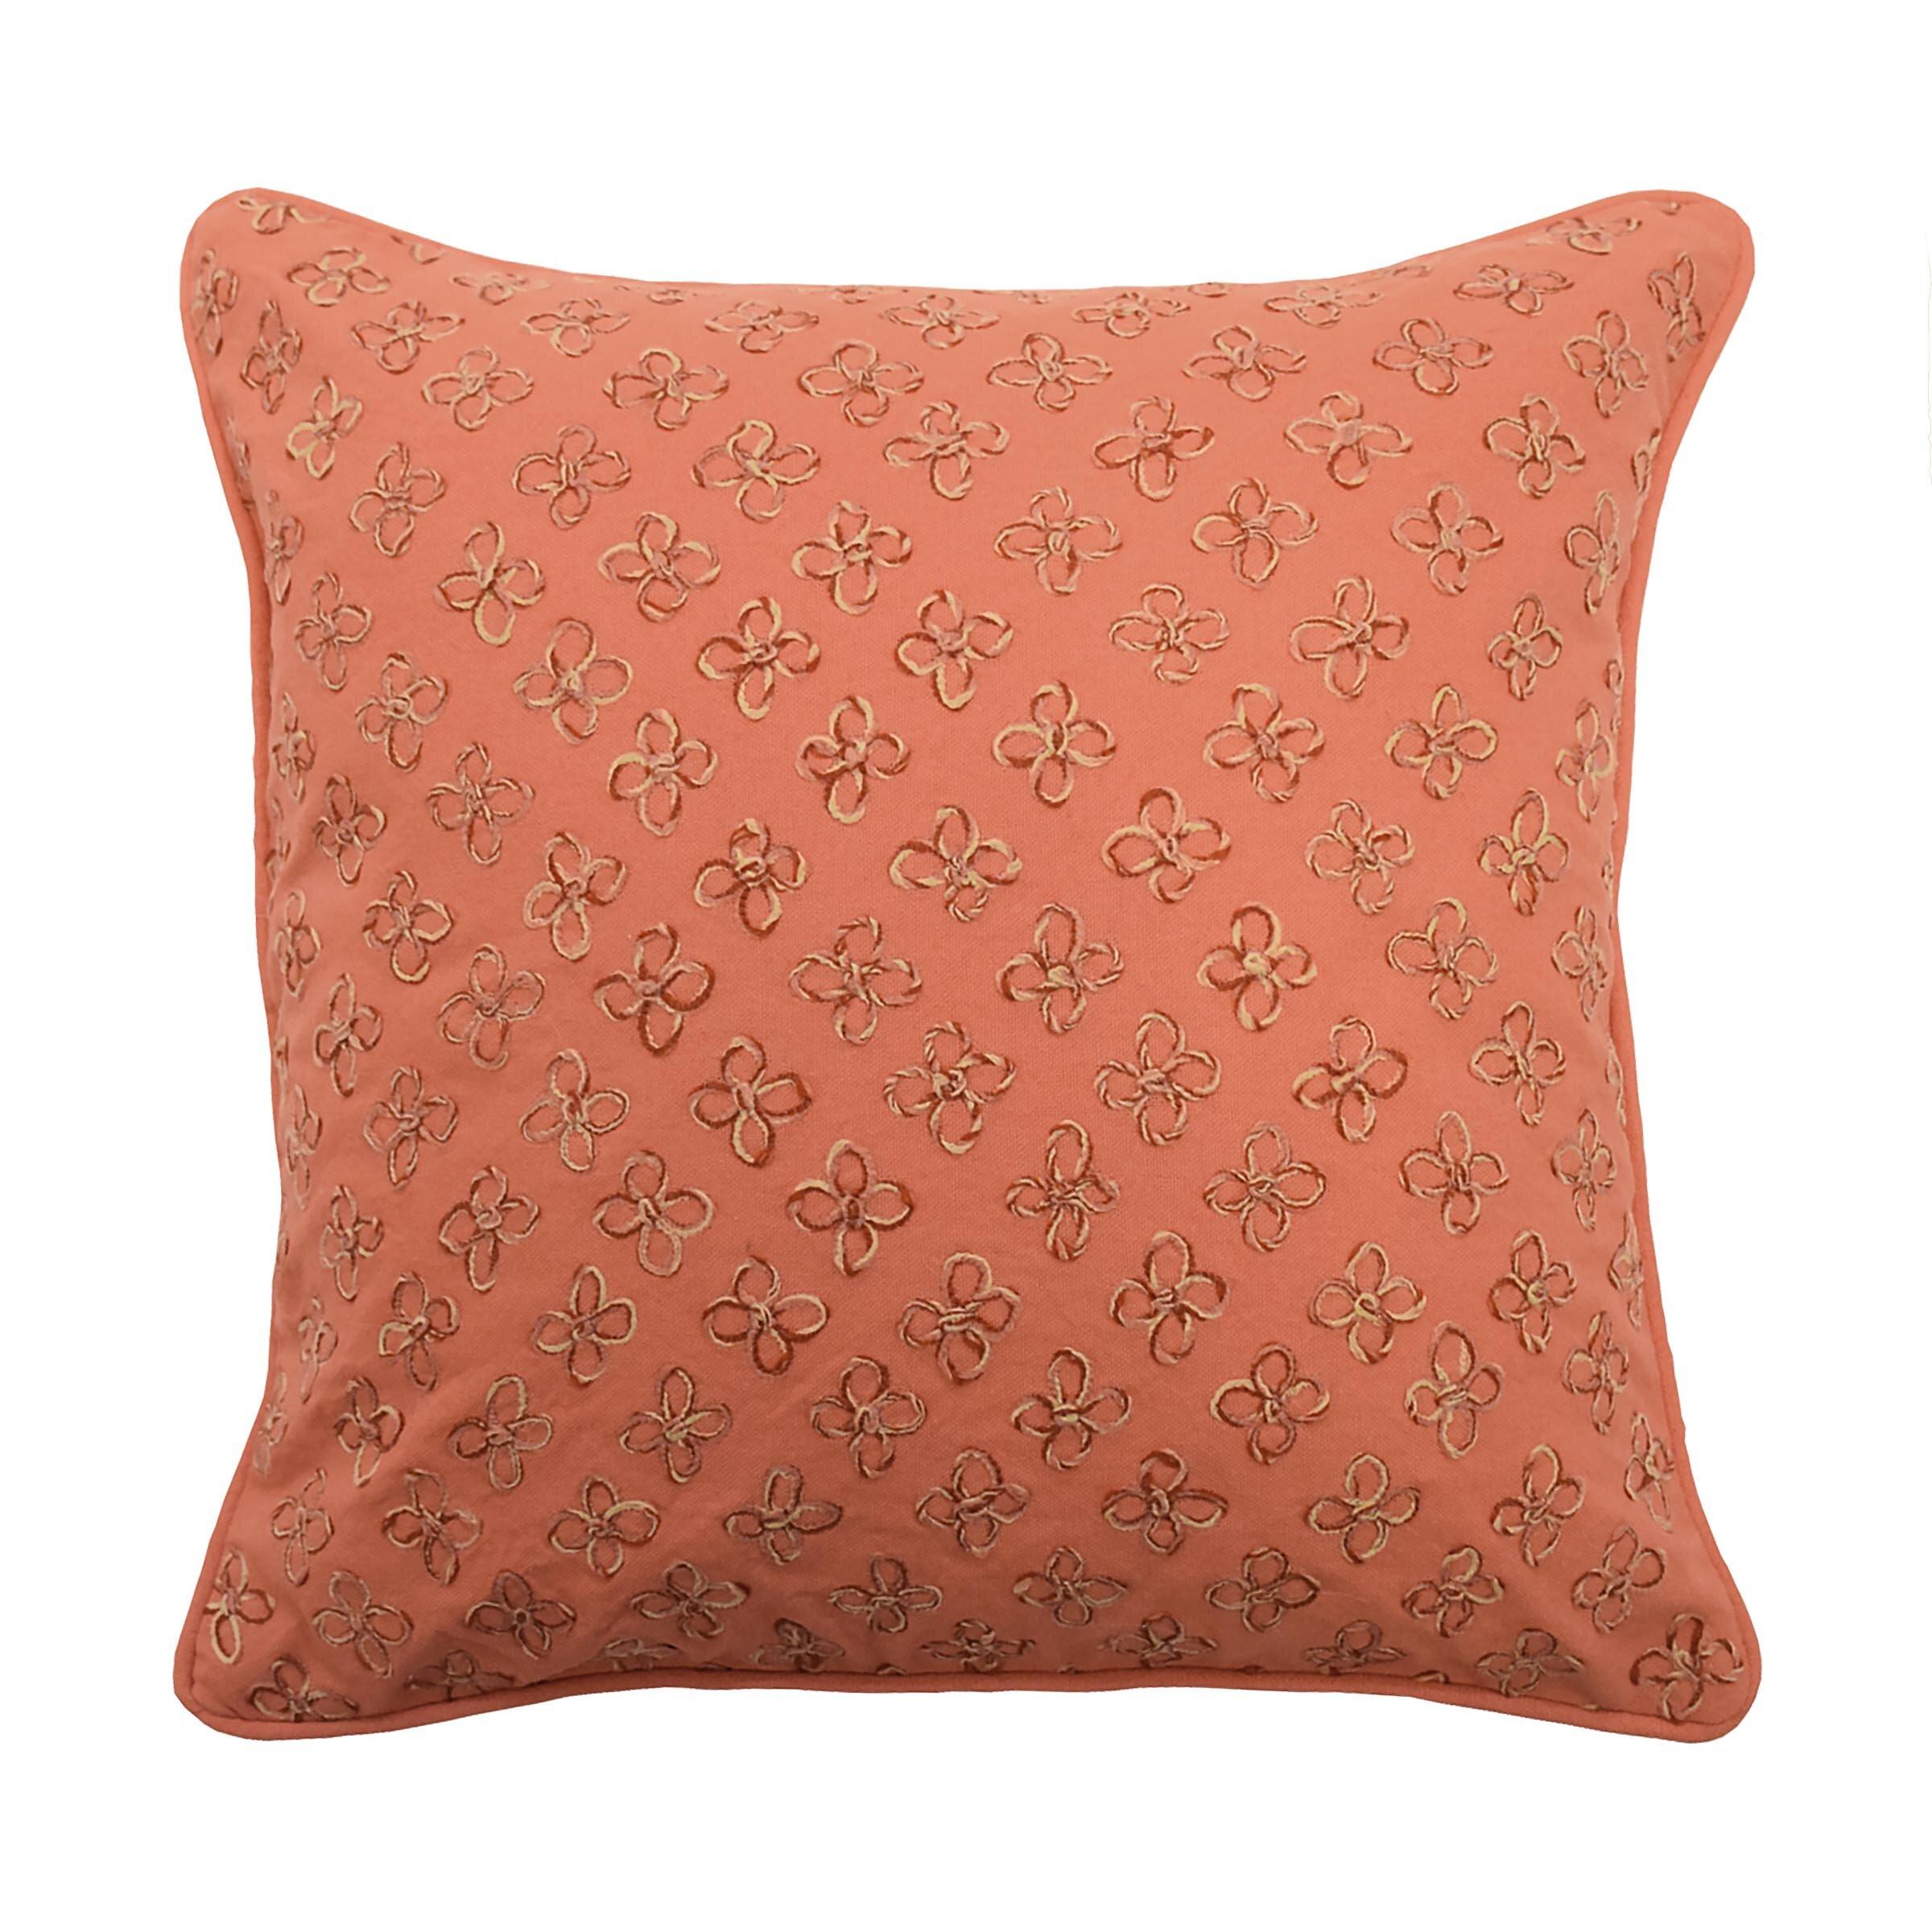 Waverly Laurel Springs Applique Cotton Throw Pillow Reviews Wayfair